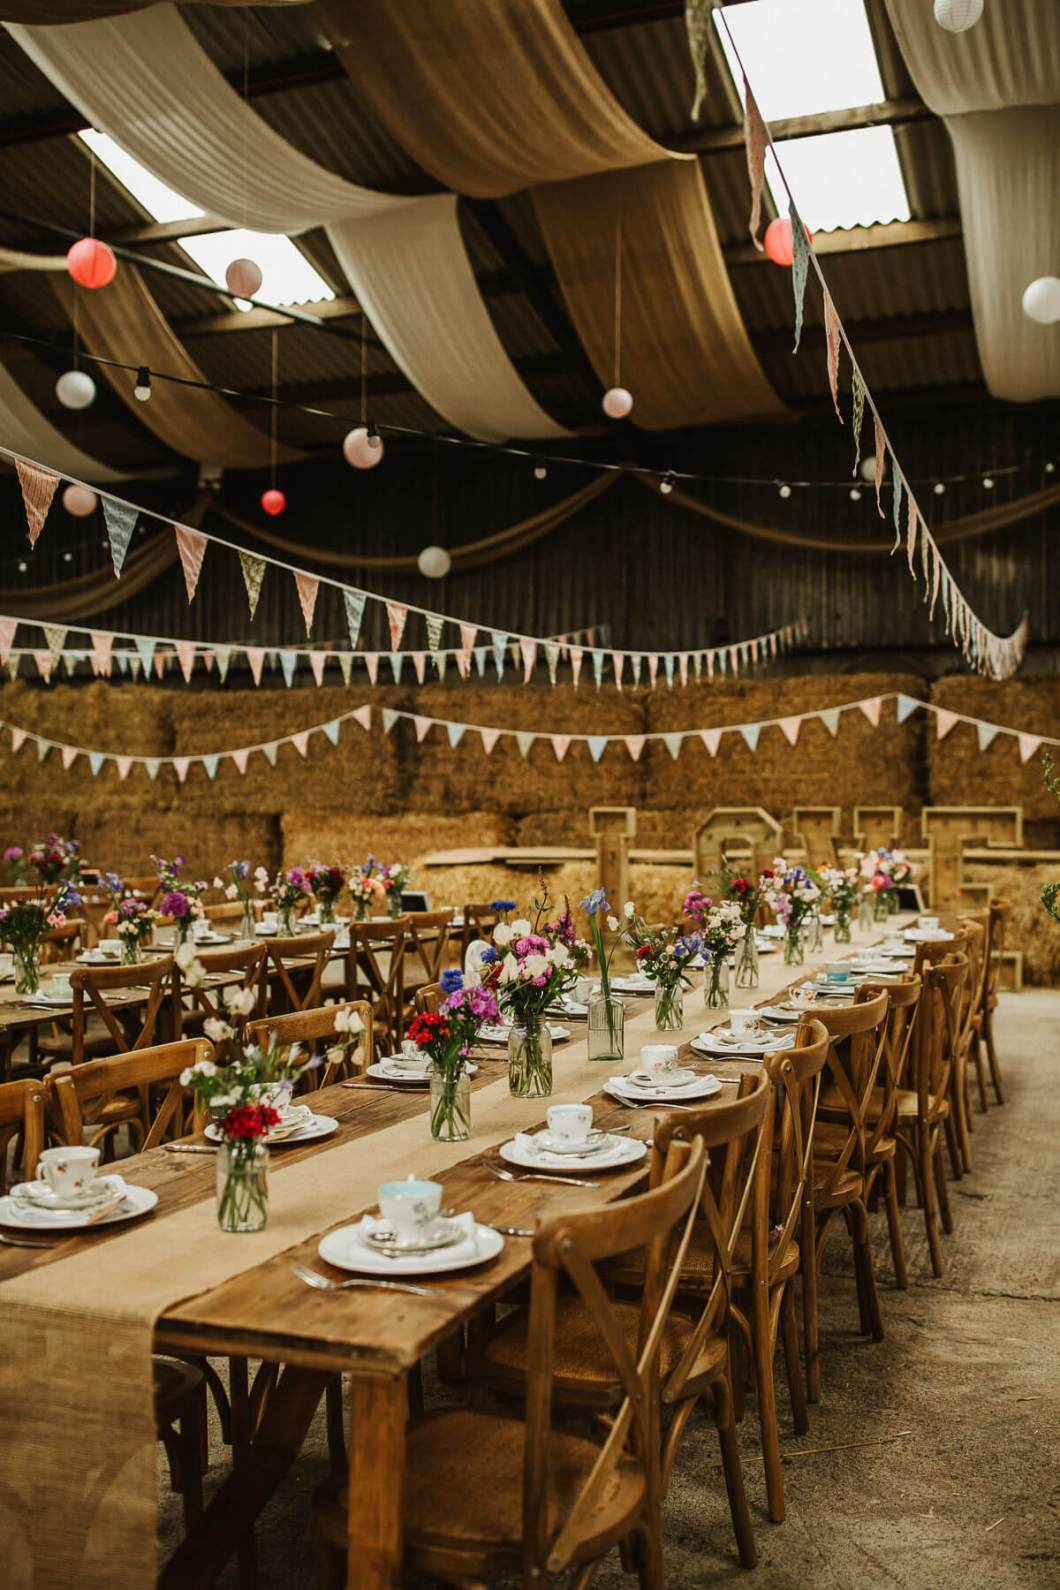 Farm wedding trestle table decor